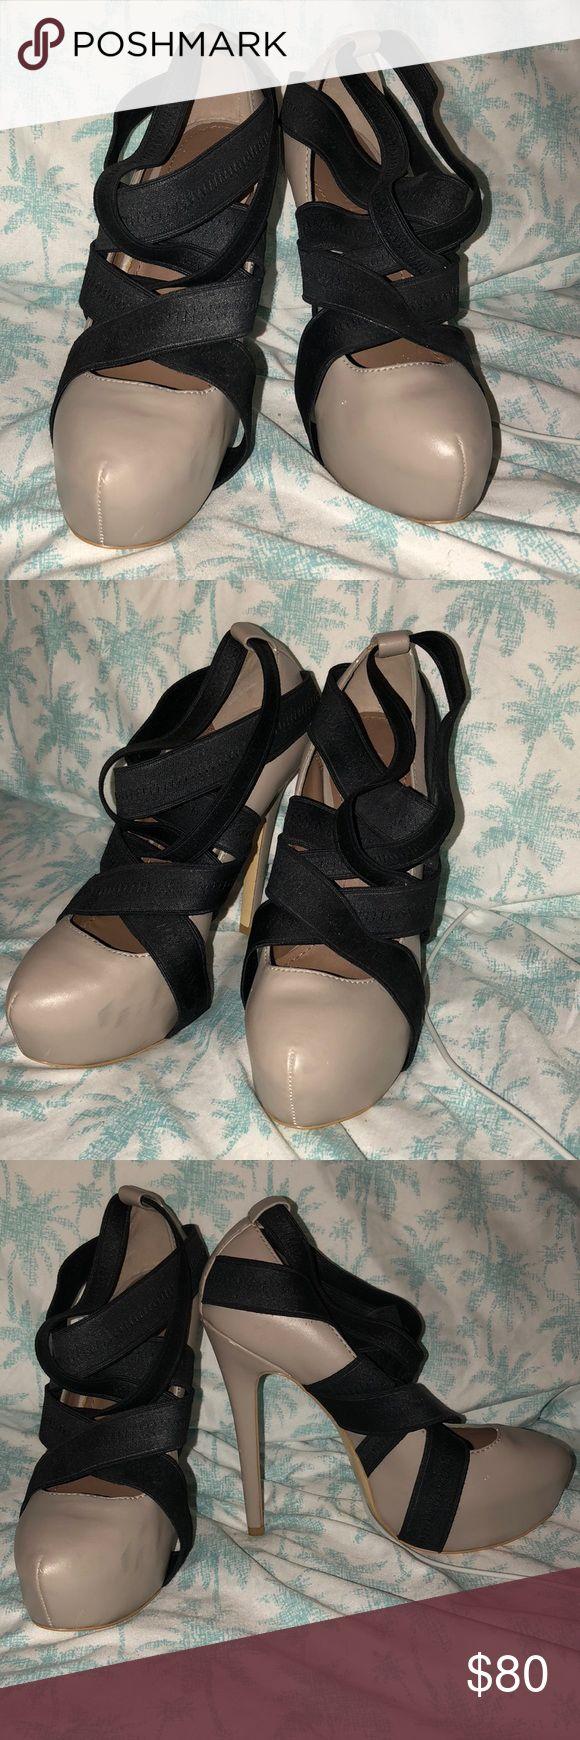 Colin Stuart nude bandage platform heels Step out like a Victoria's Secret model in these one of a kind size 7 nude bandage pumps. Colin Stuart Shoes Heels